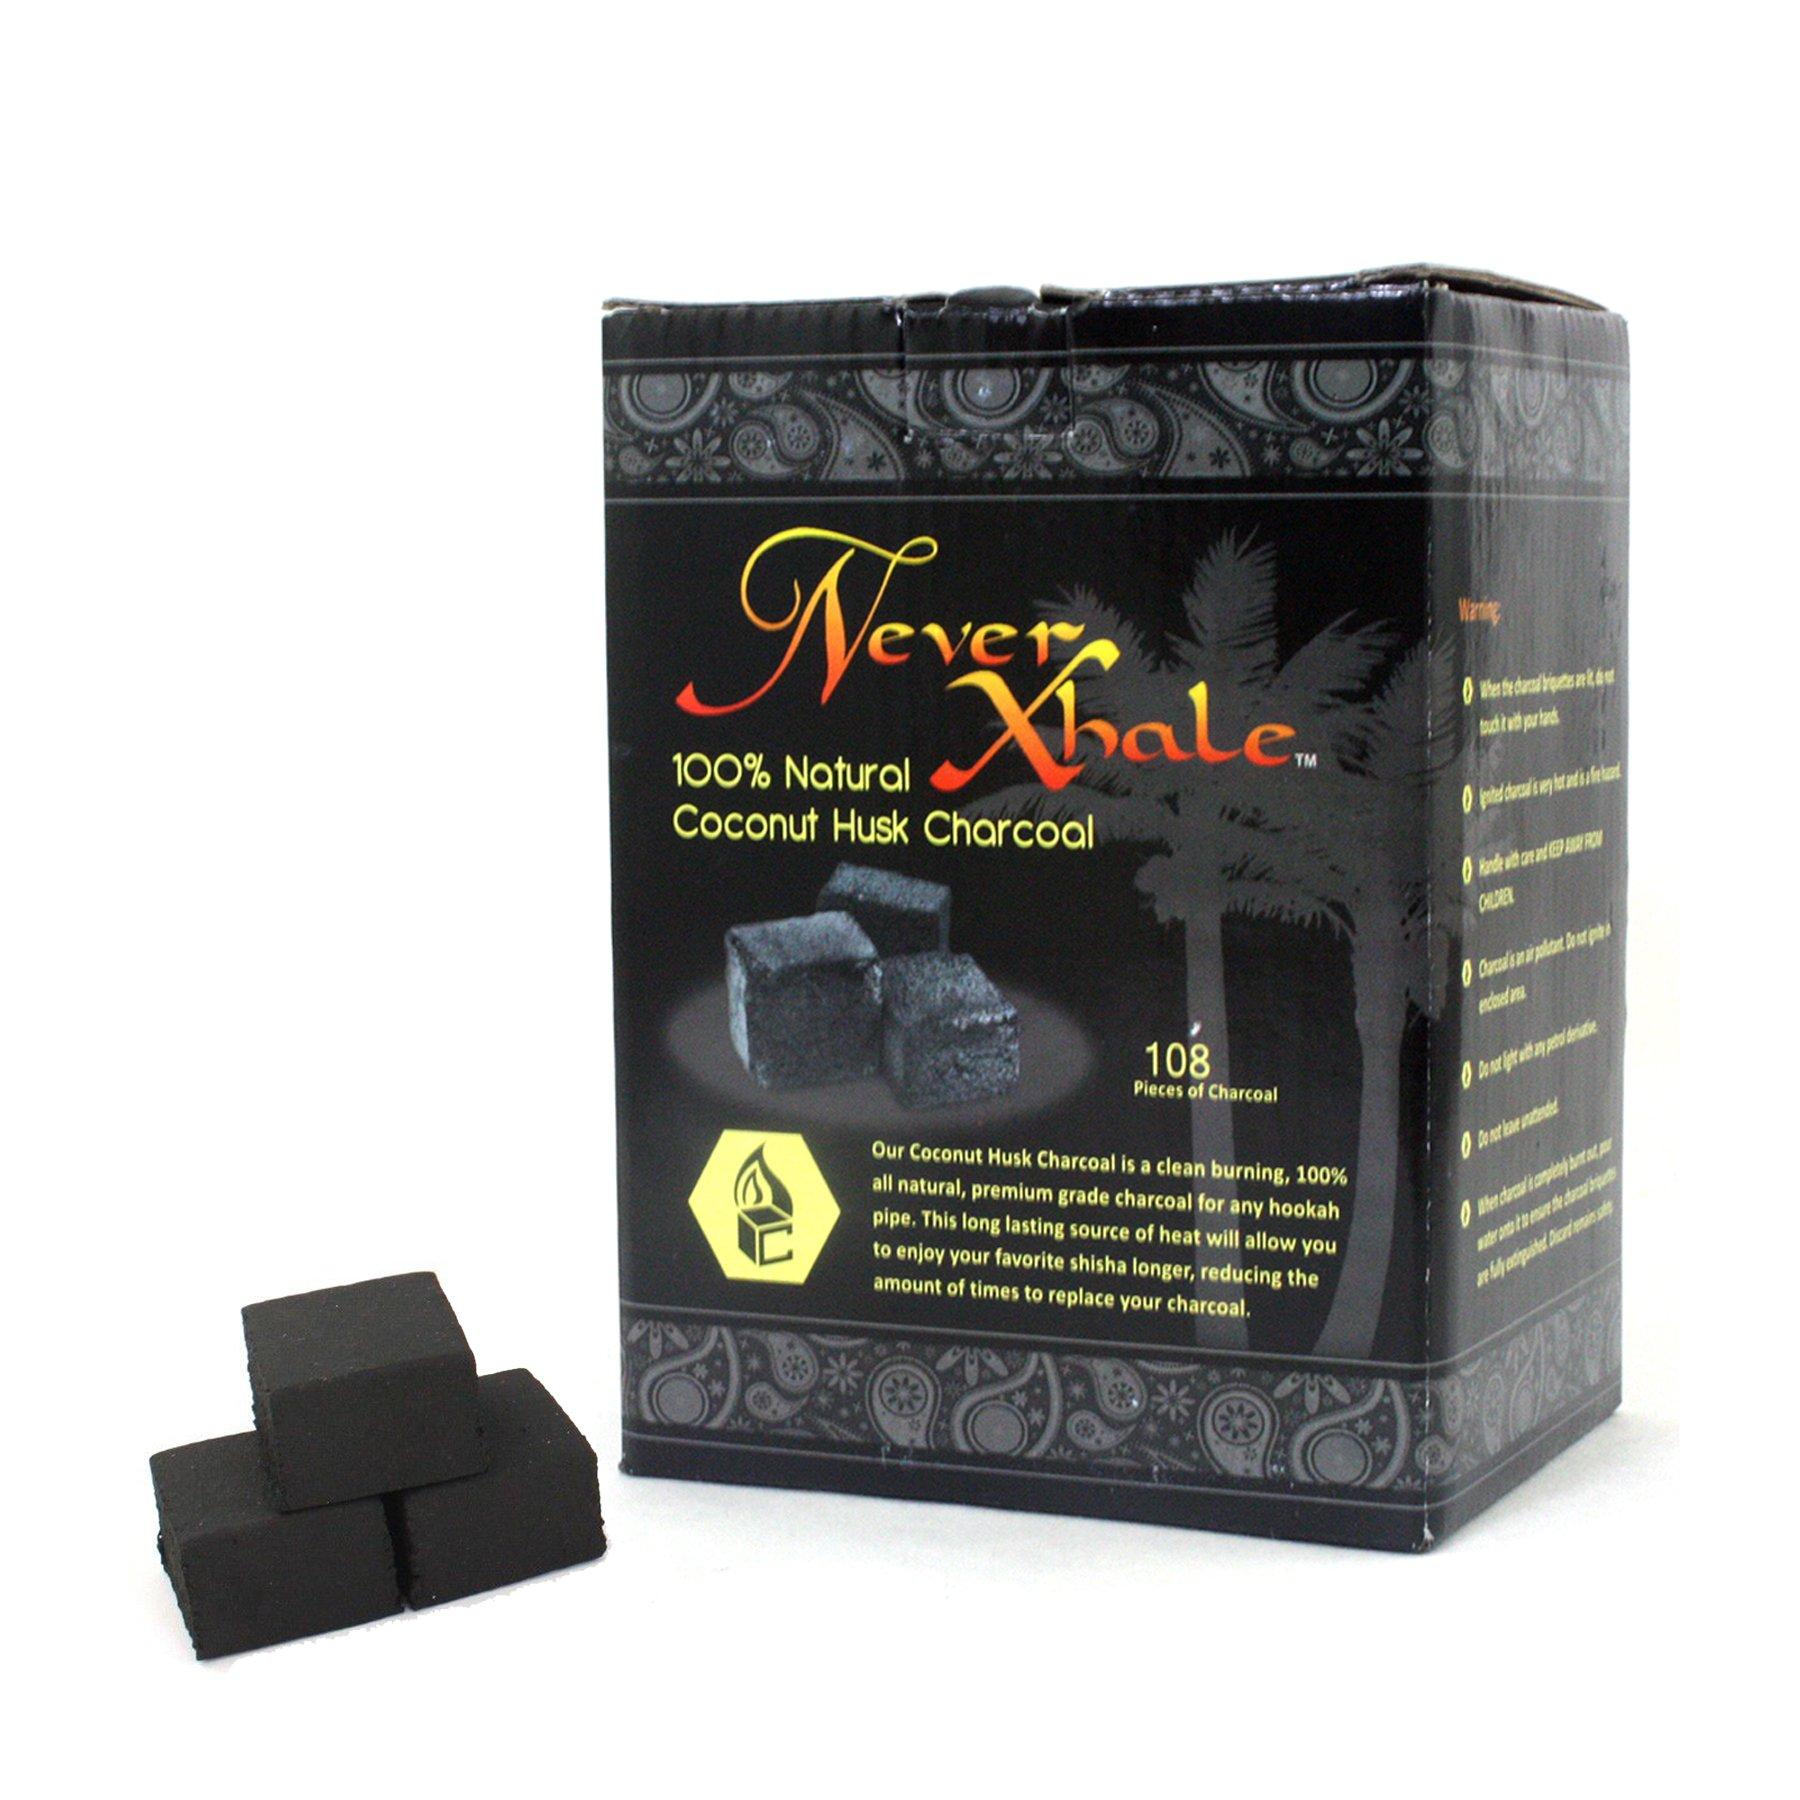 NeverXhale 108pc Premium 100% All Natural Coconut Husk Hookah Charcoal Coal